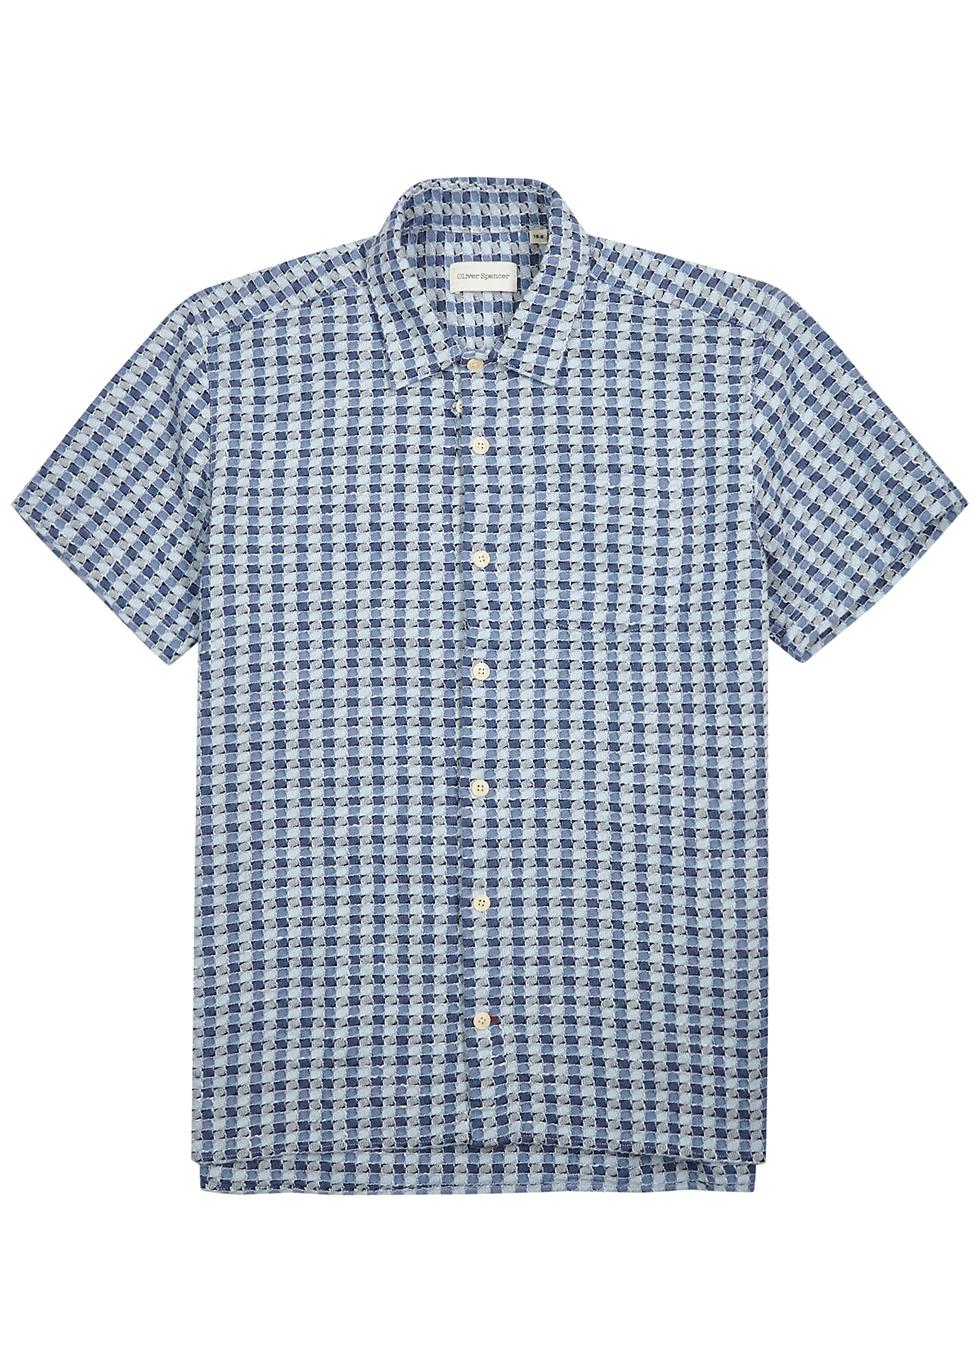 Ebley blue checked cotton shirt